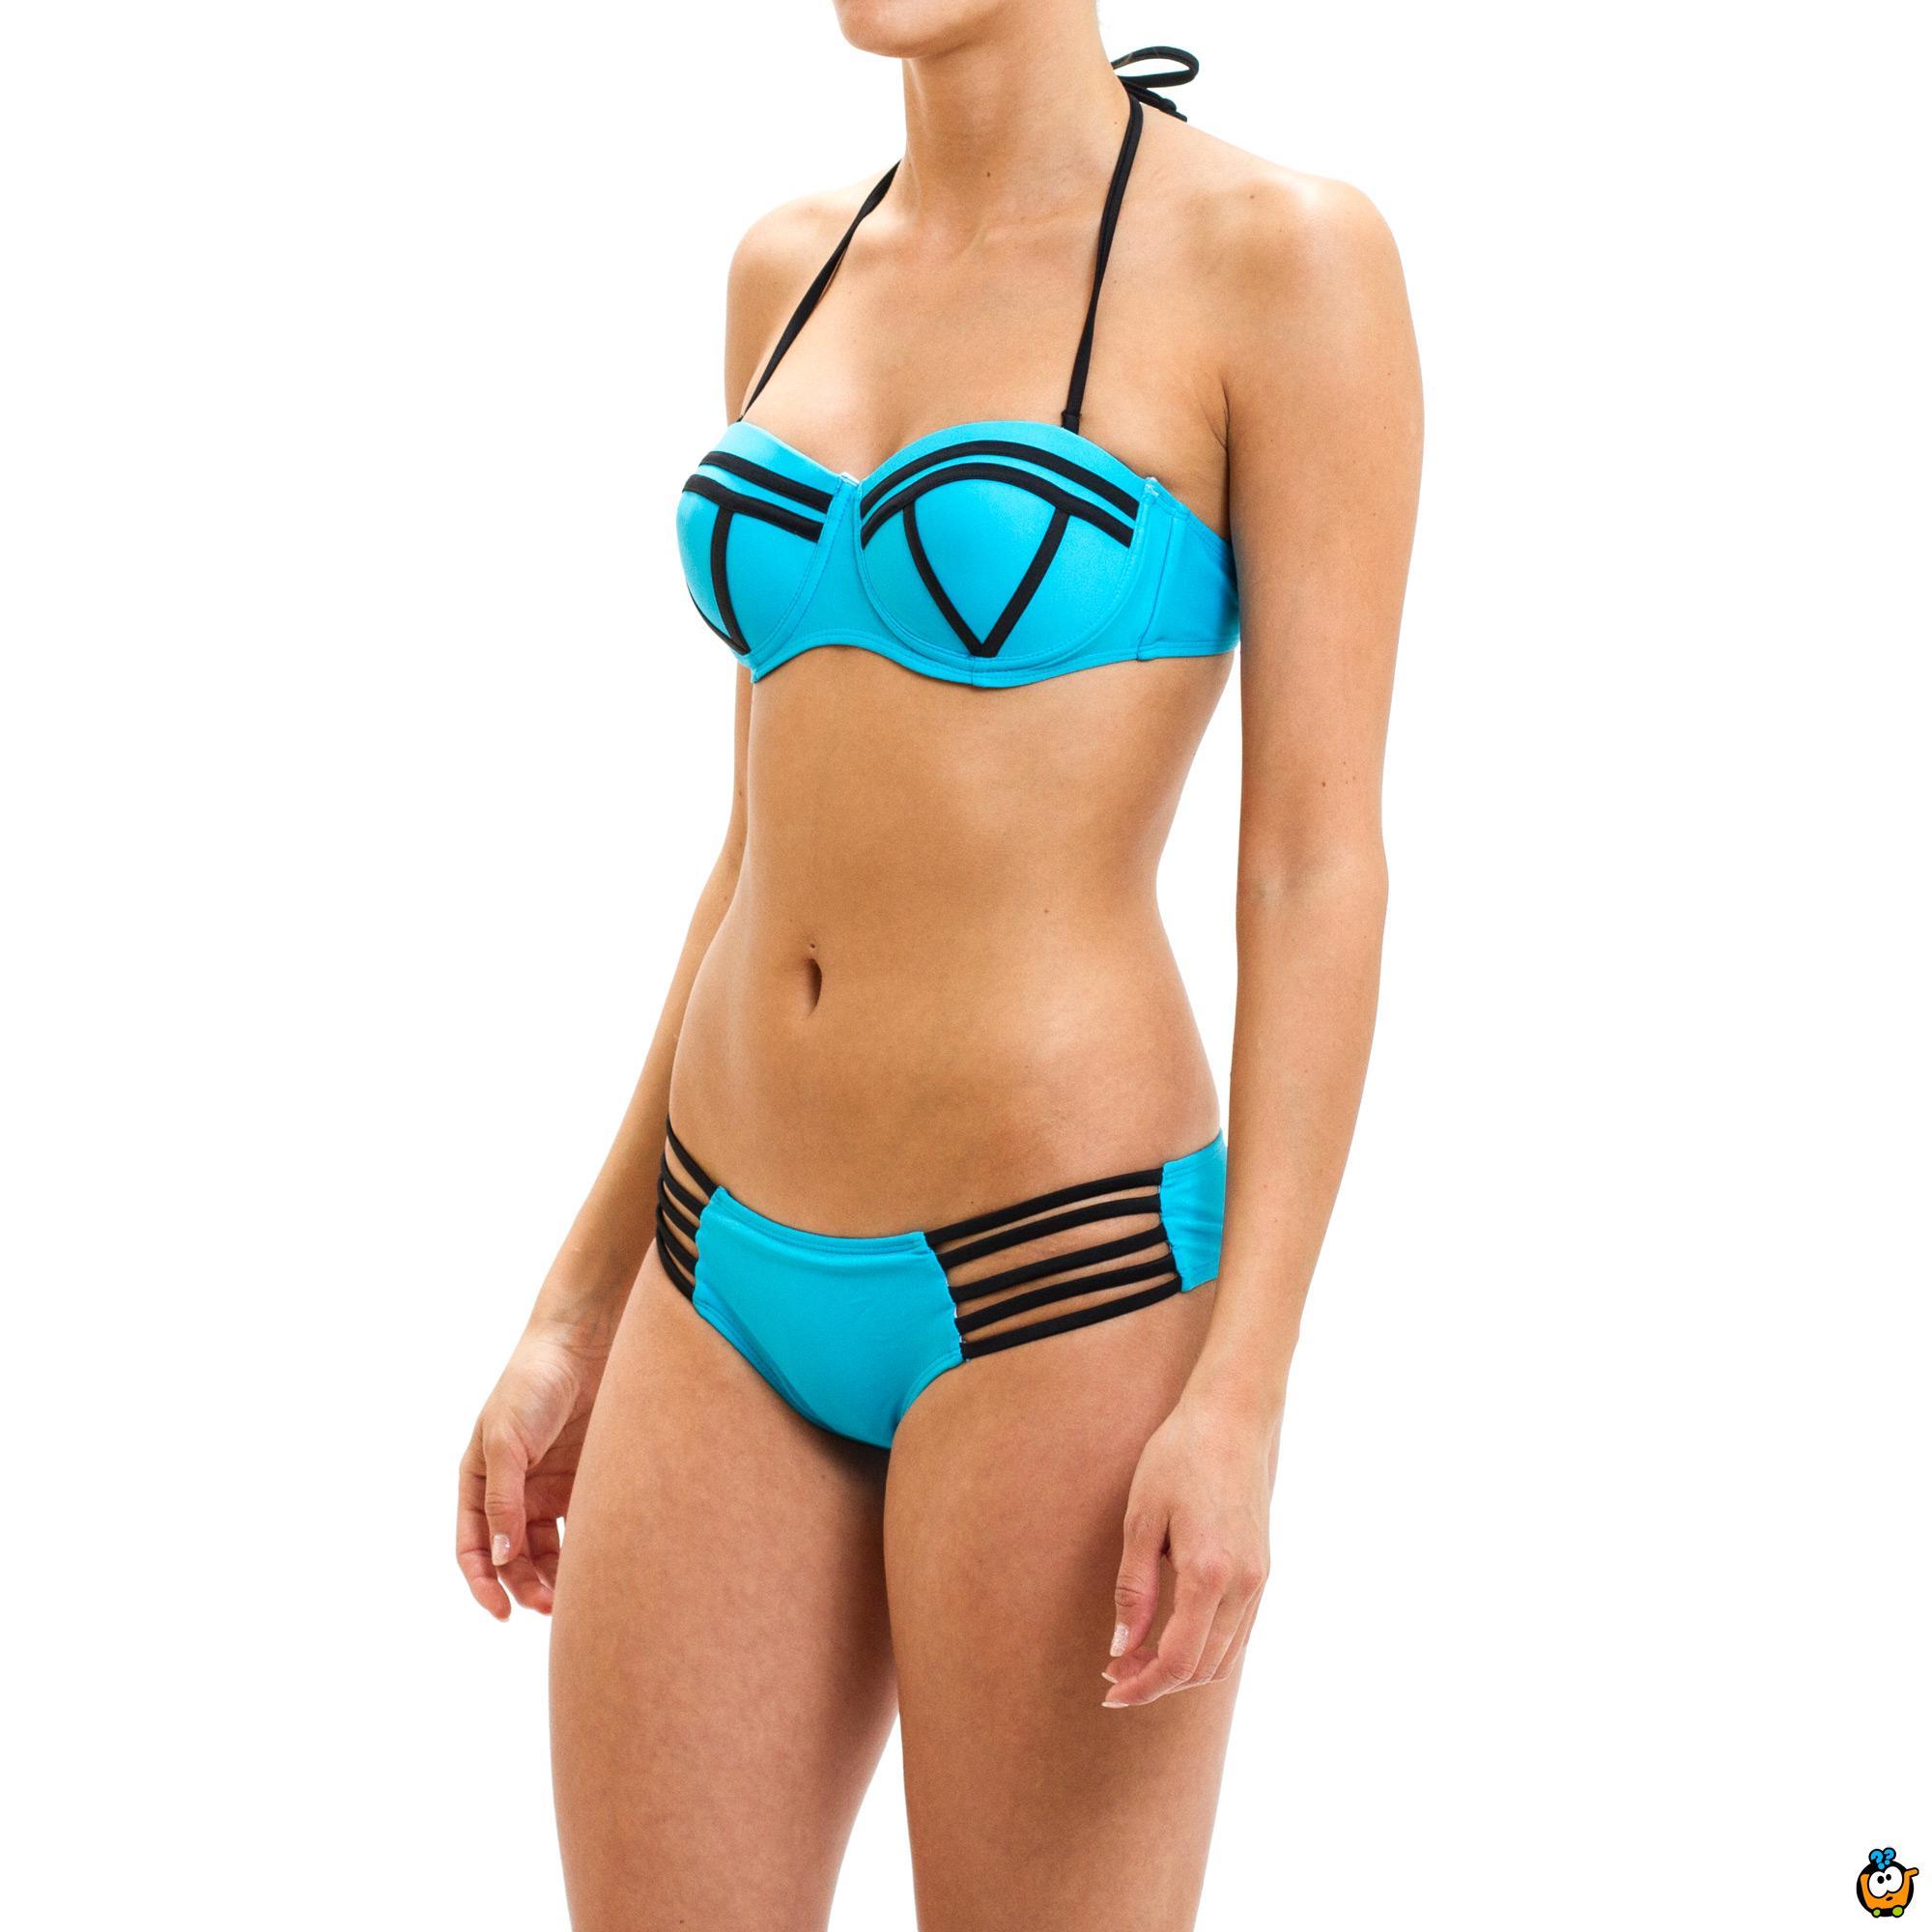 Dvodelni ženski kupaći kostim - SUPER GIRL BLUE